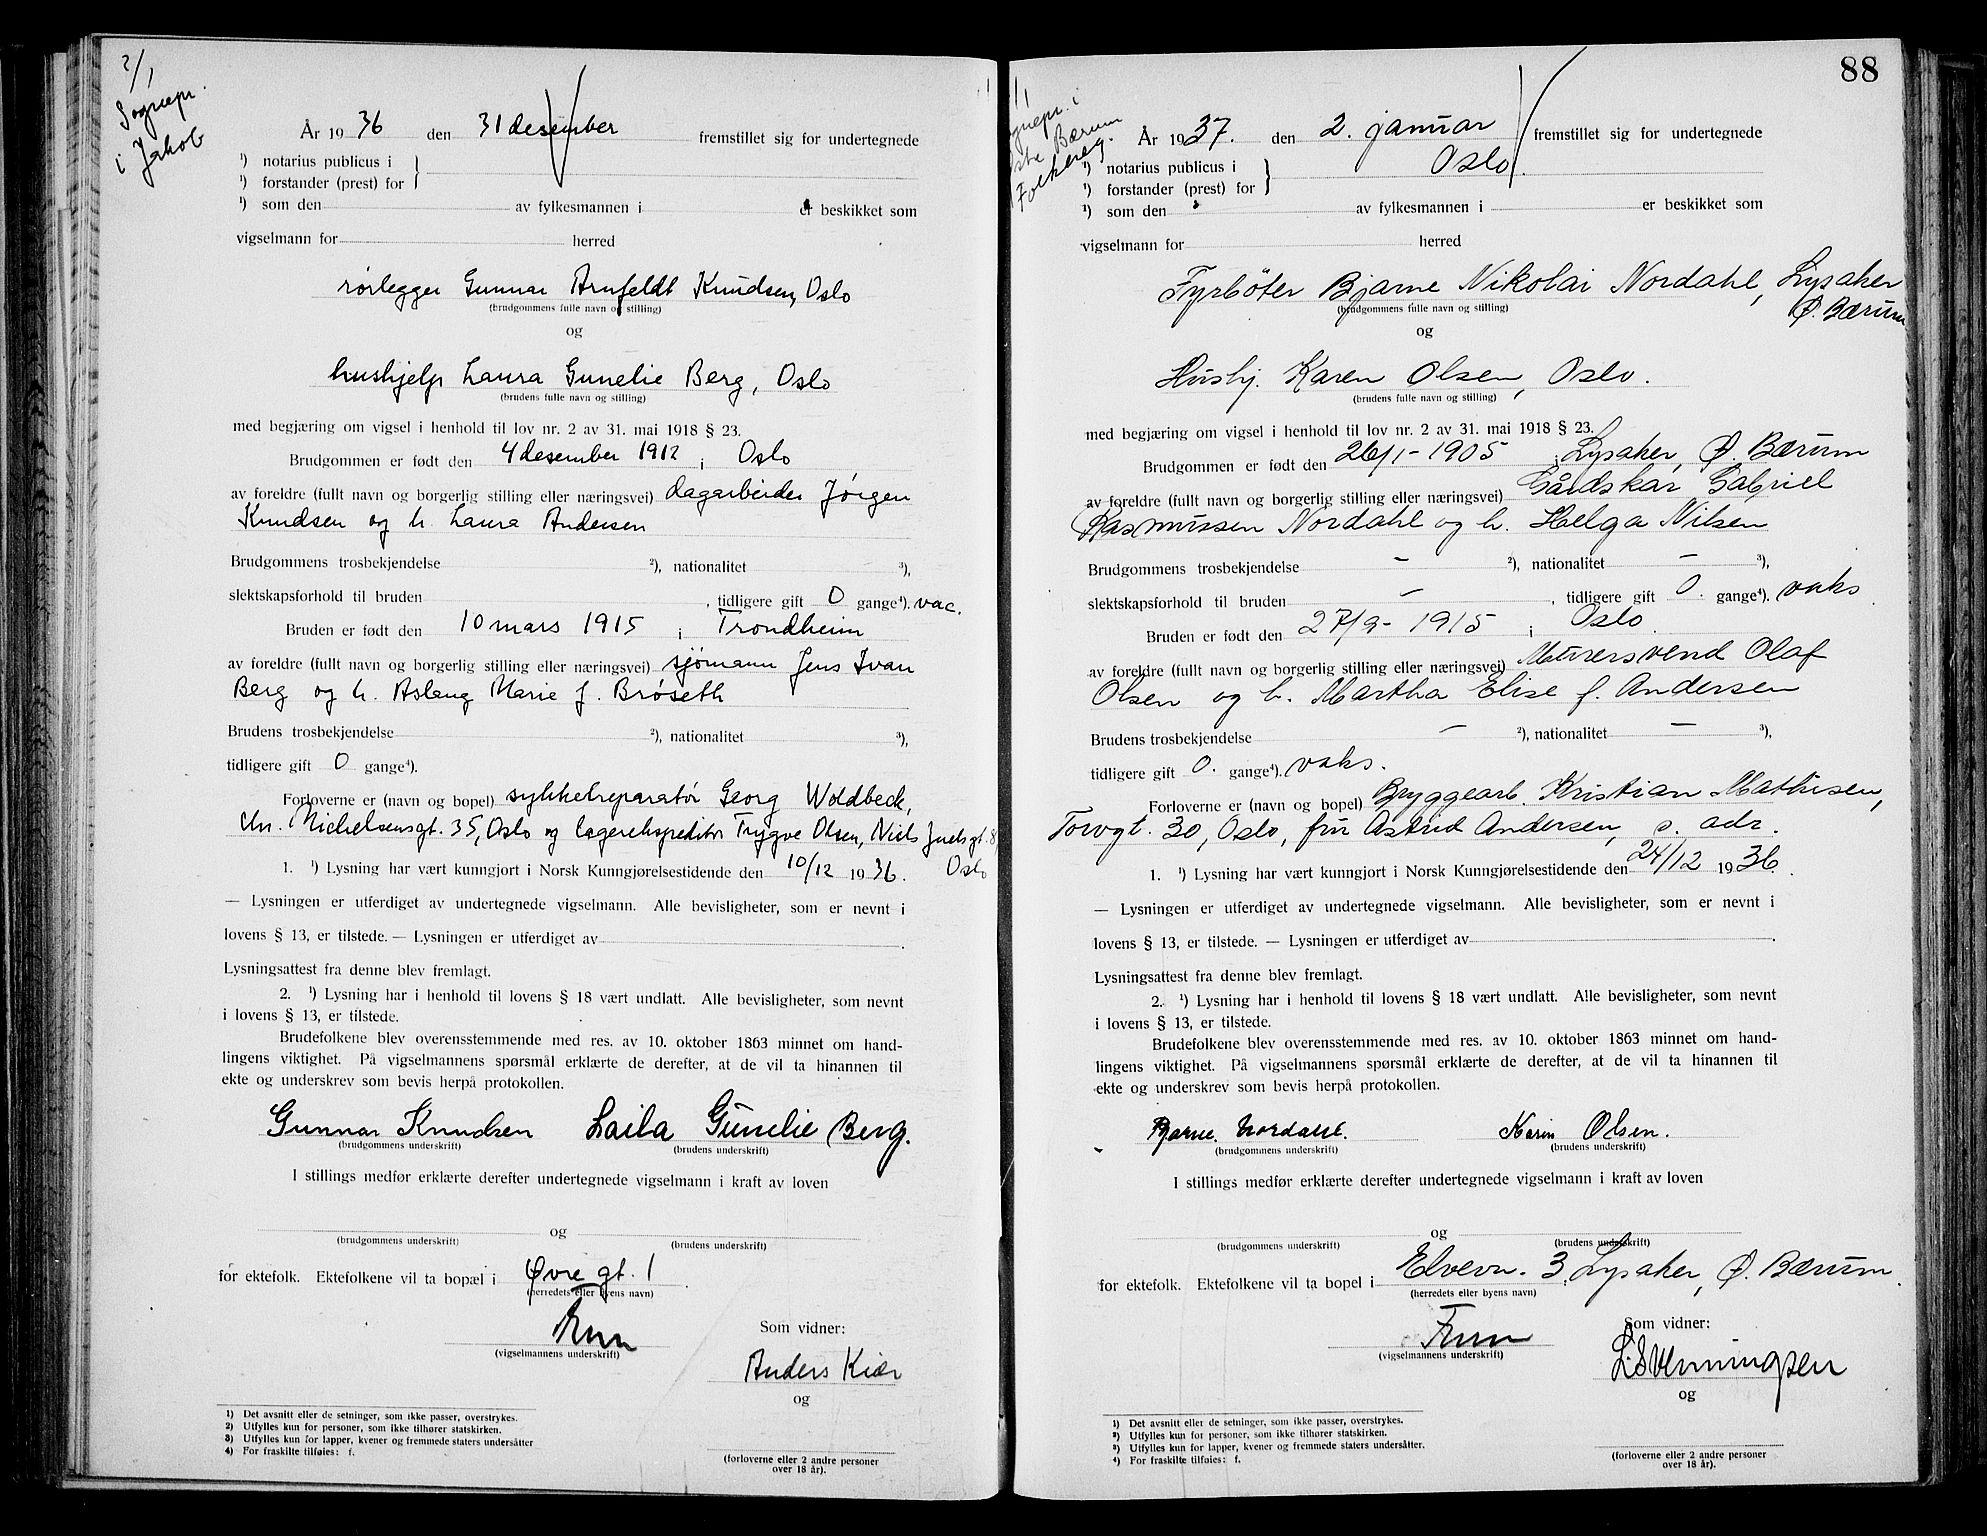 SAO, Oslo byfogd avd. I, L/Lb/Lbb/L0027: Notarialprotokoll, rekke II: Vigsler, 1936-1937, s. 87b-88a